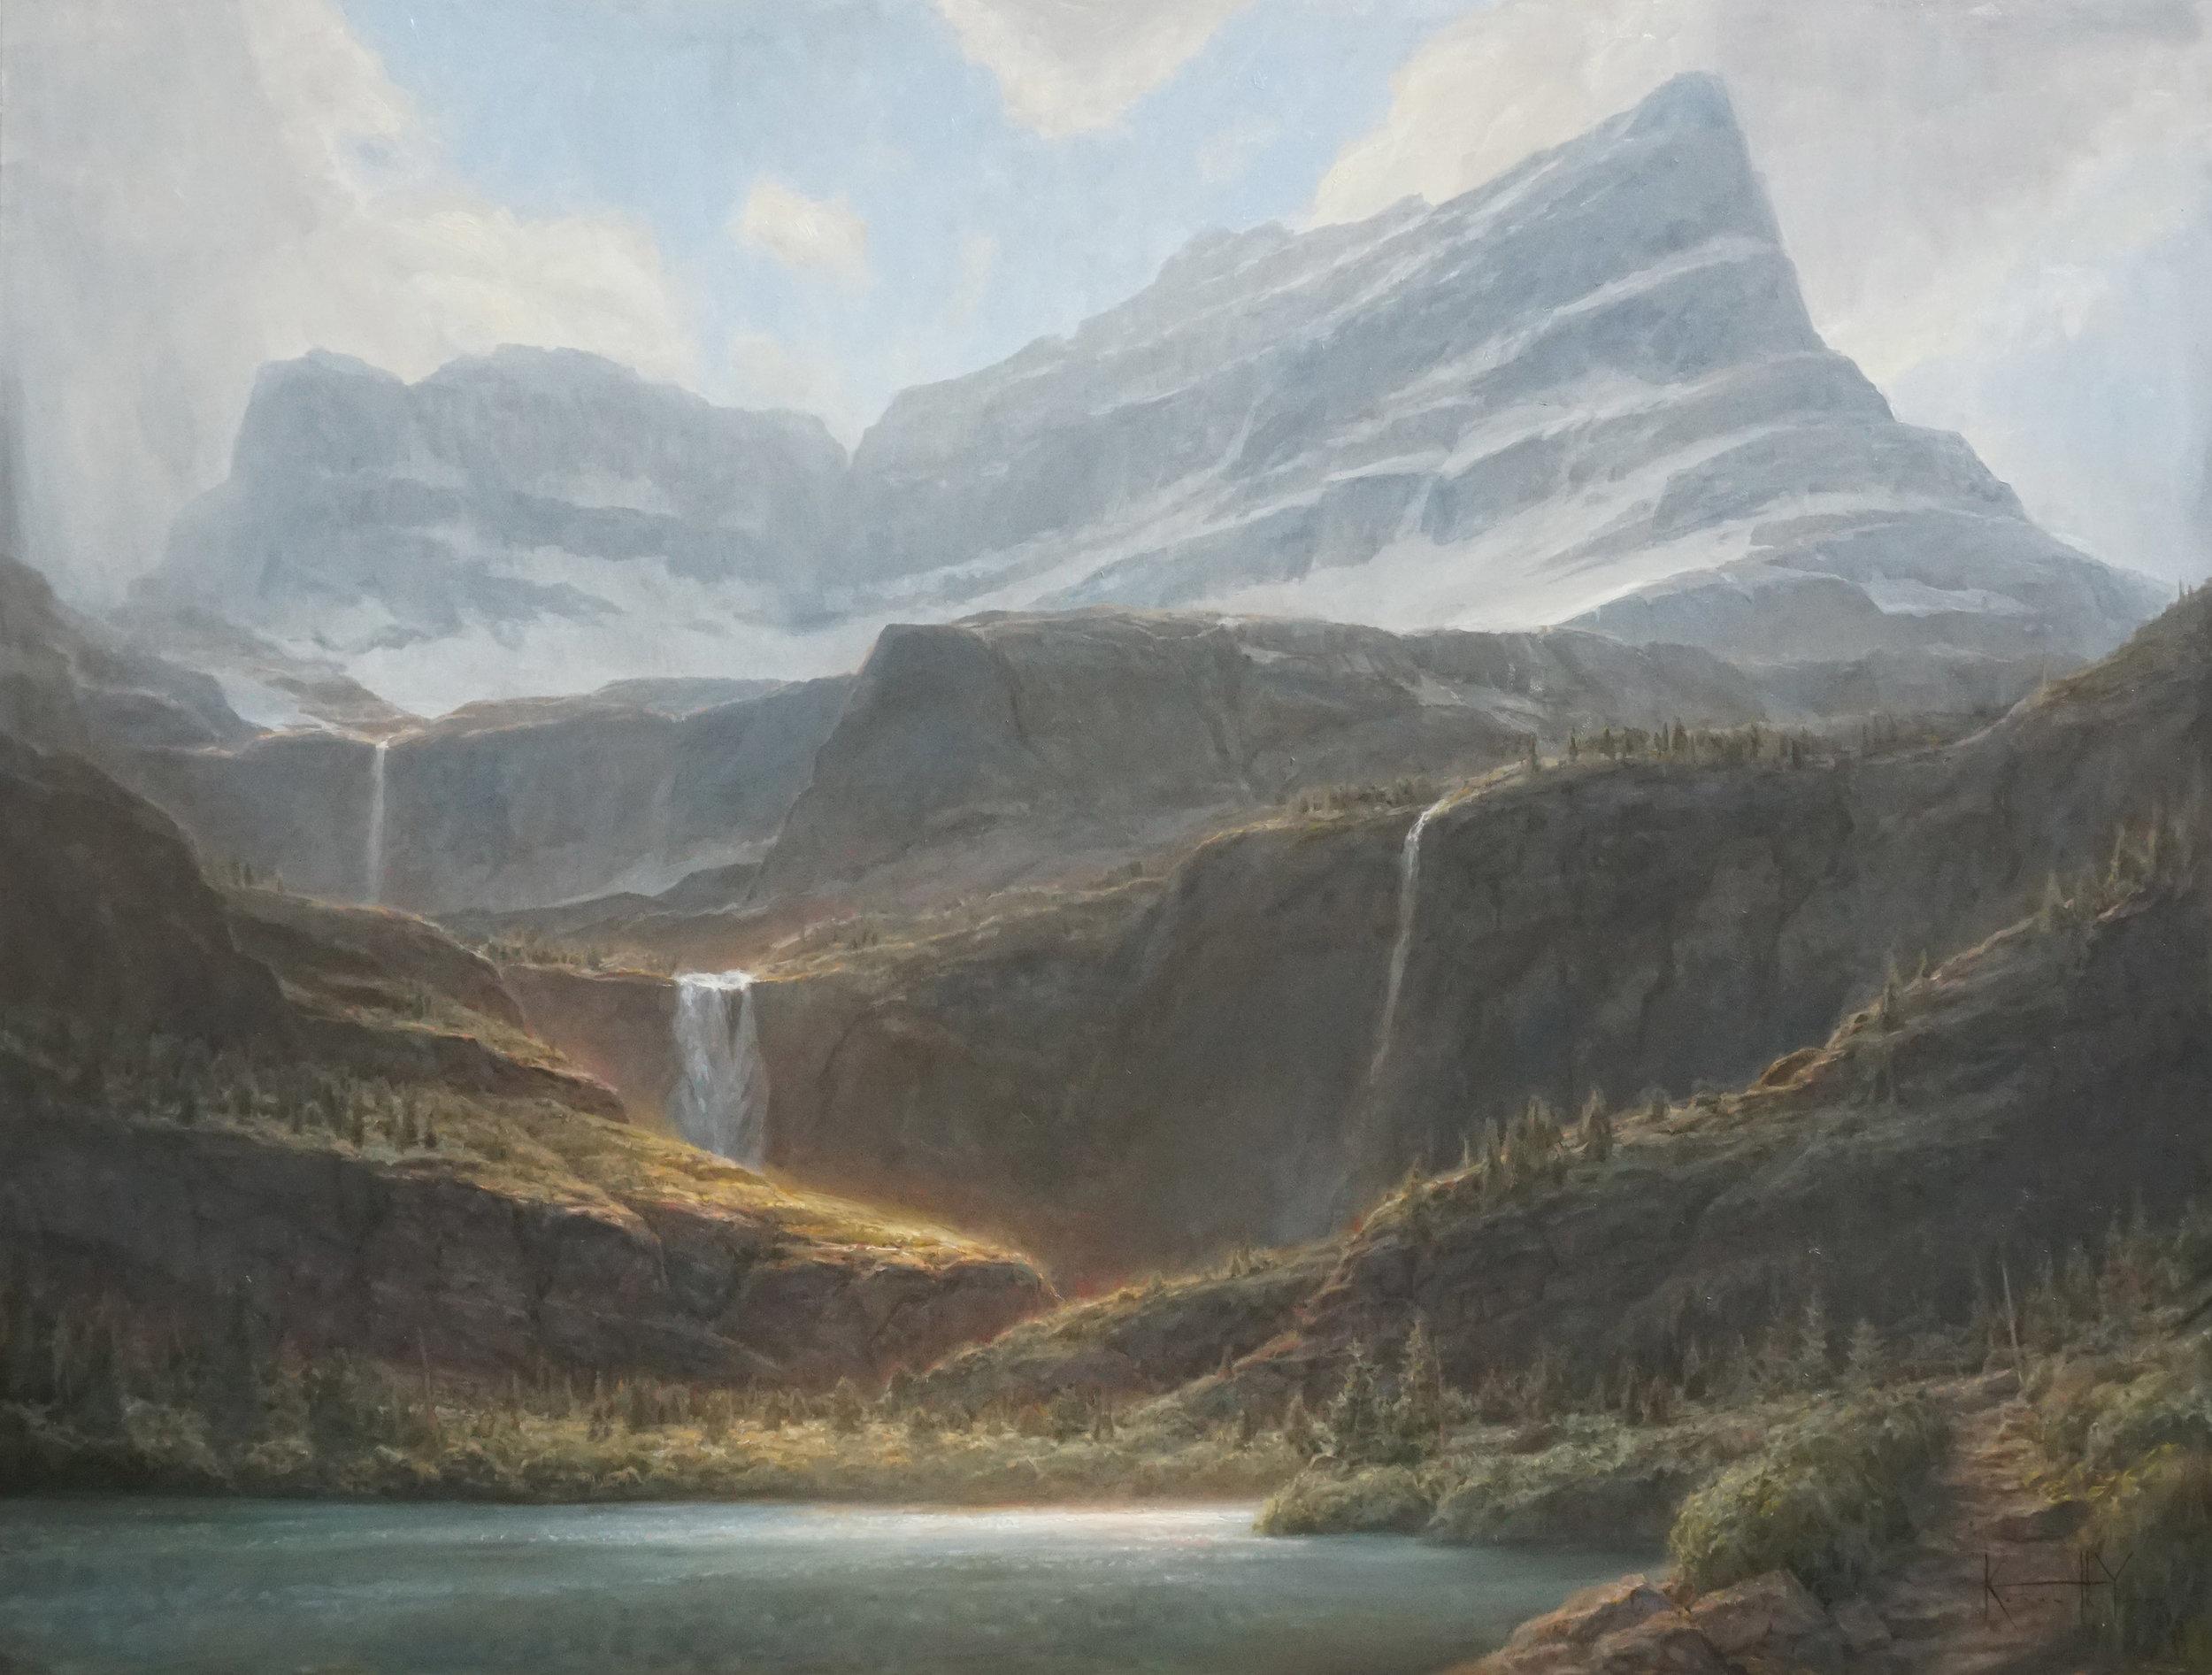 Winter Falling - 36x48 - Sold